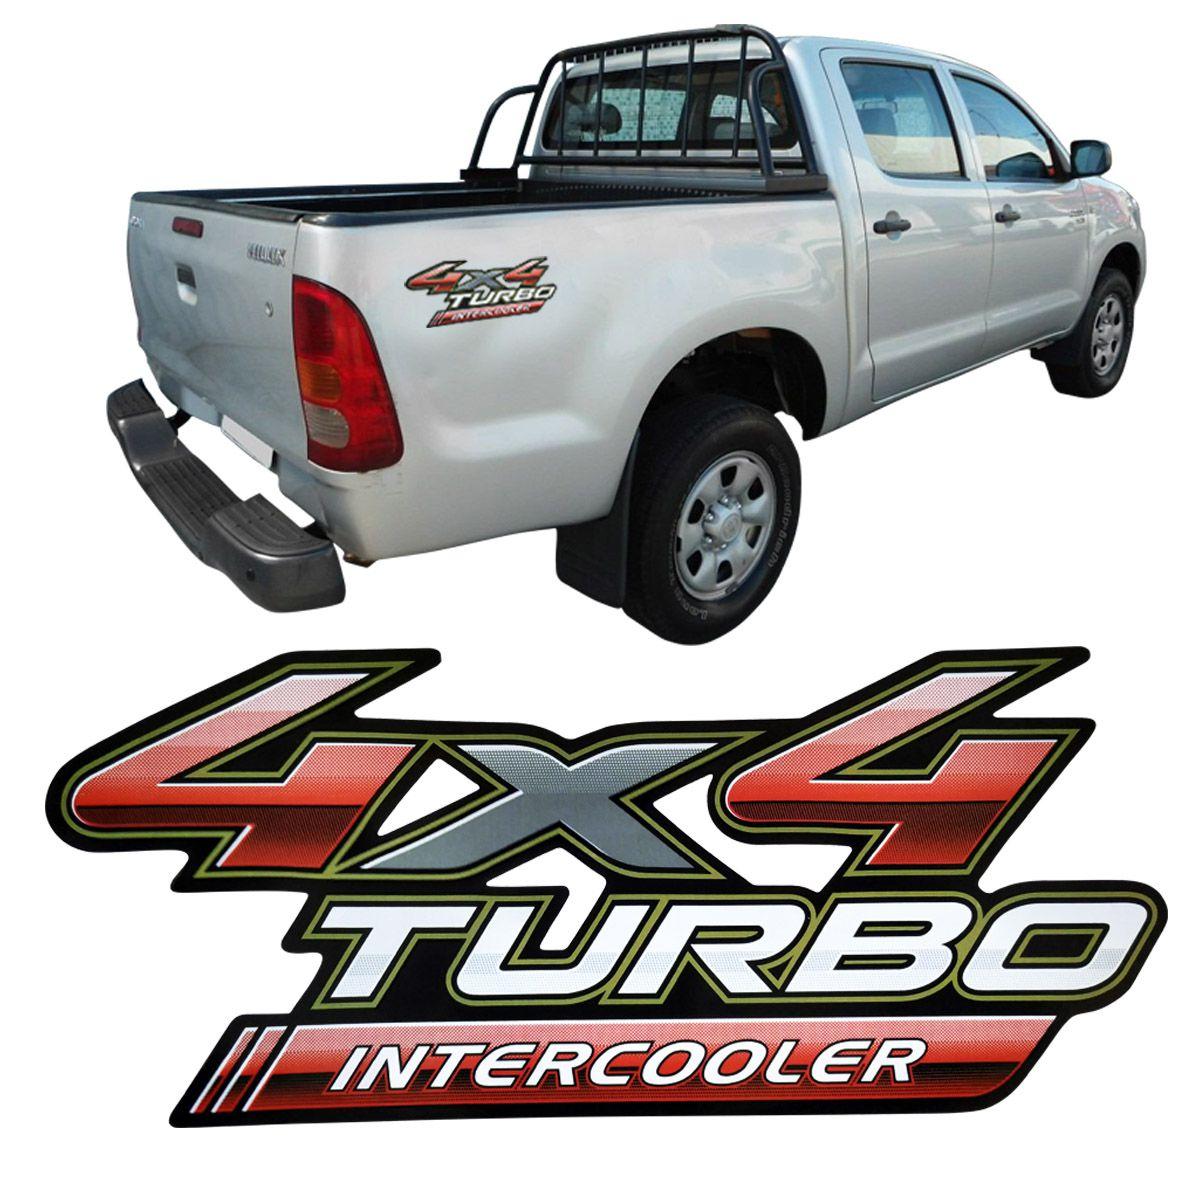 Adesivo Lateral Traseiro Hilux 4x4 Turbo Intercooler Diadema